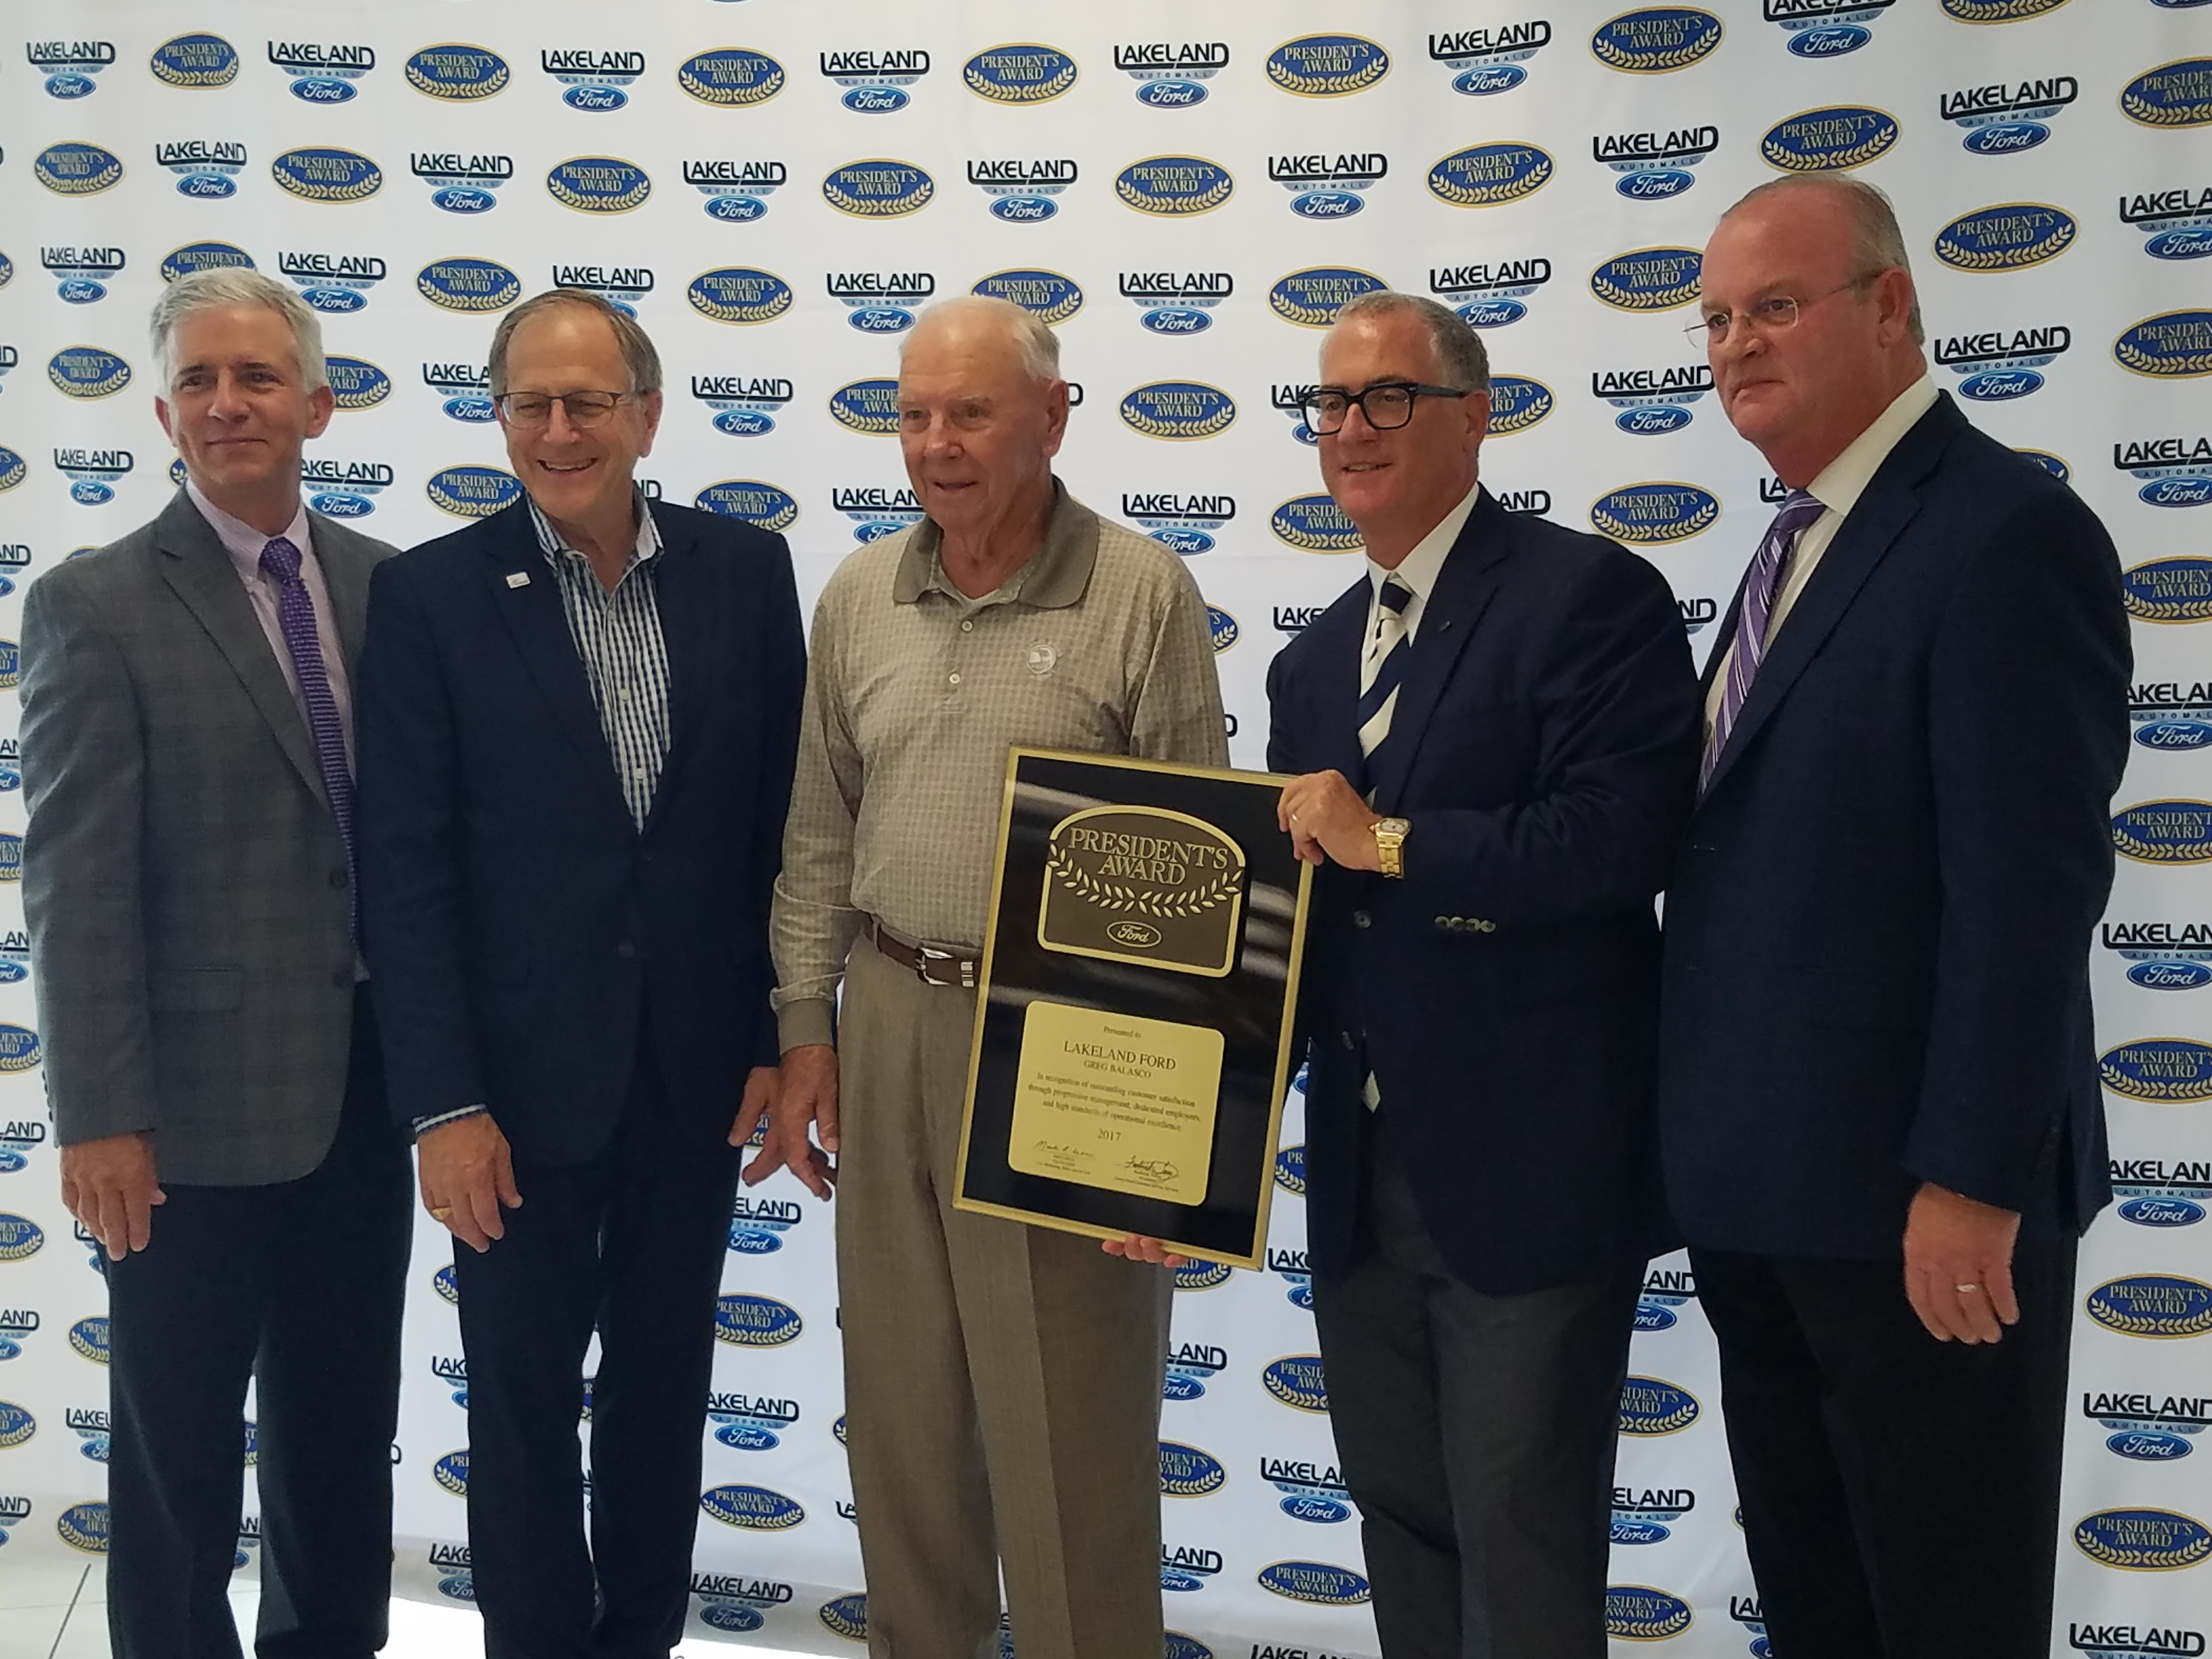 Lakeland Ford Presidents Award presentation